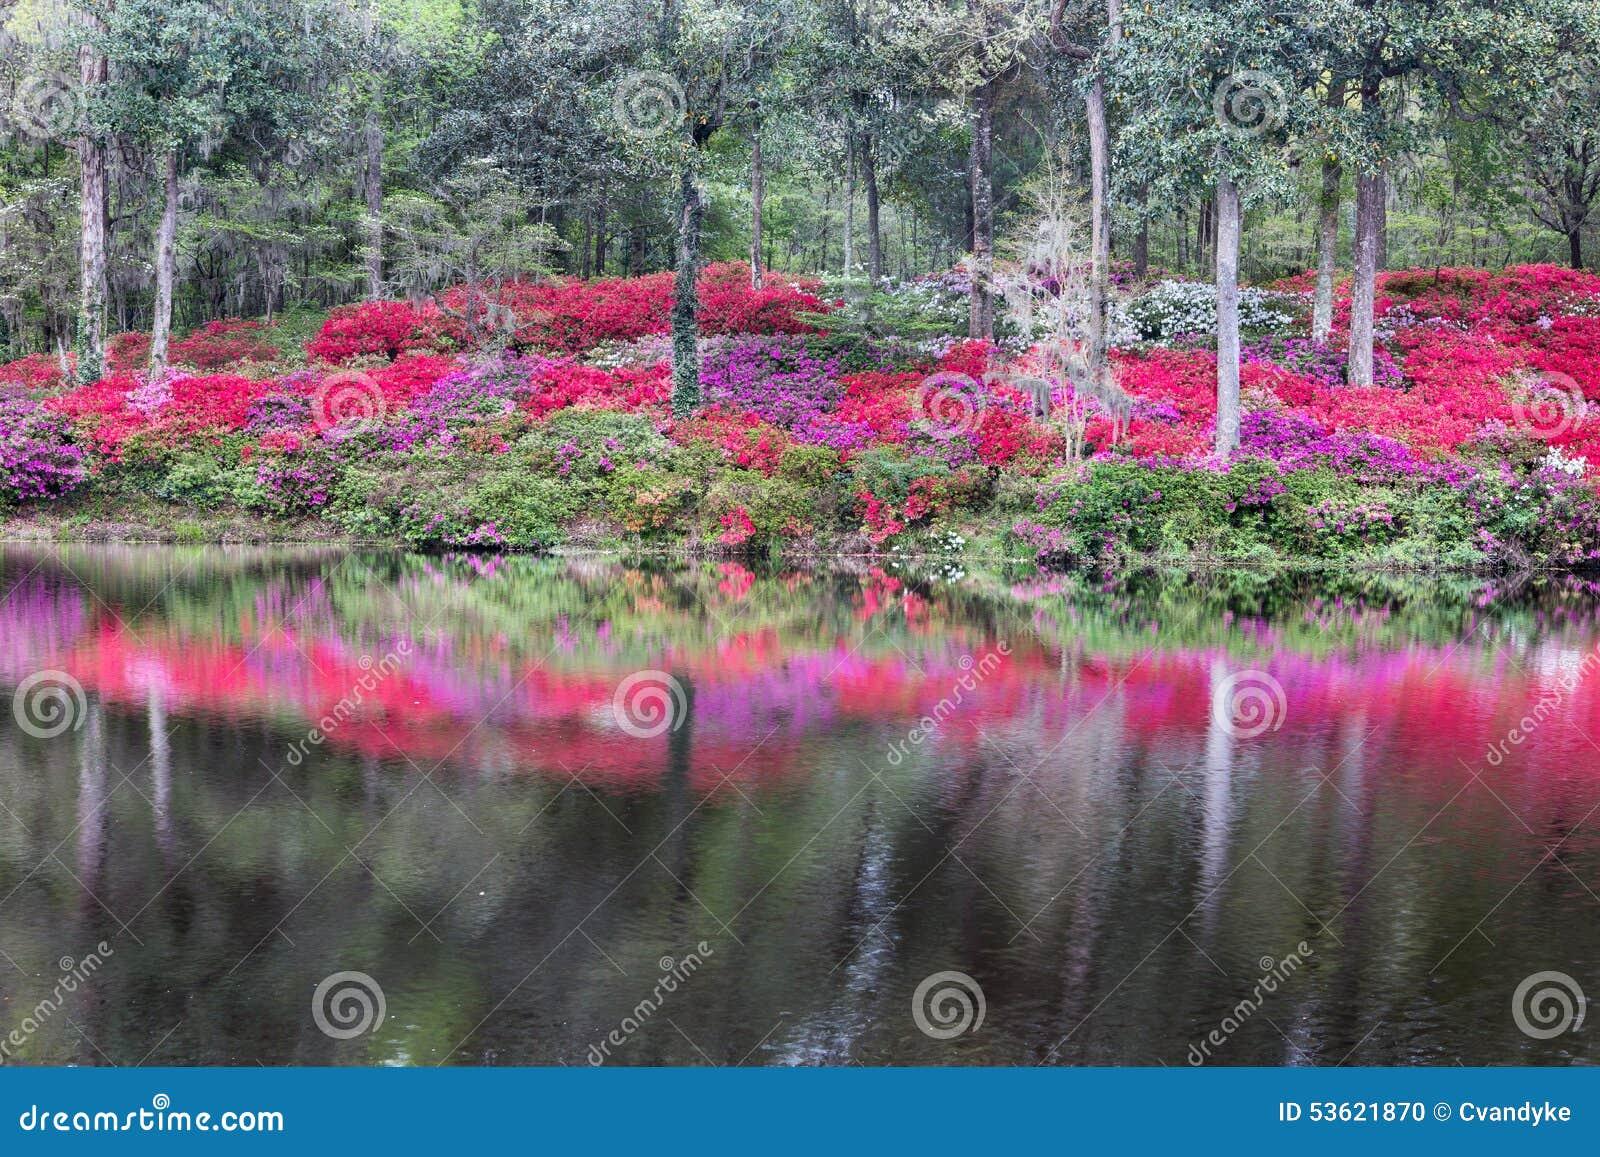 Openluchtsc van Hellingsazalea garden water reflection